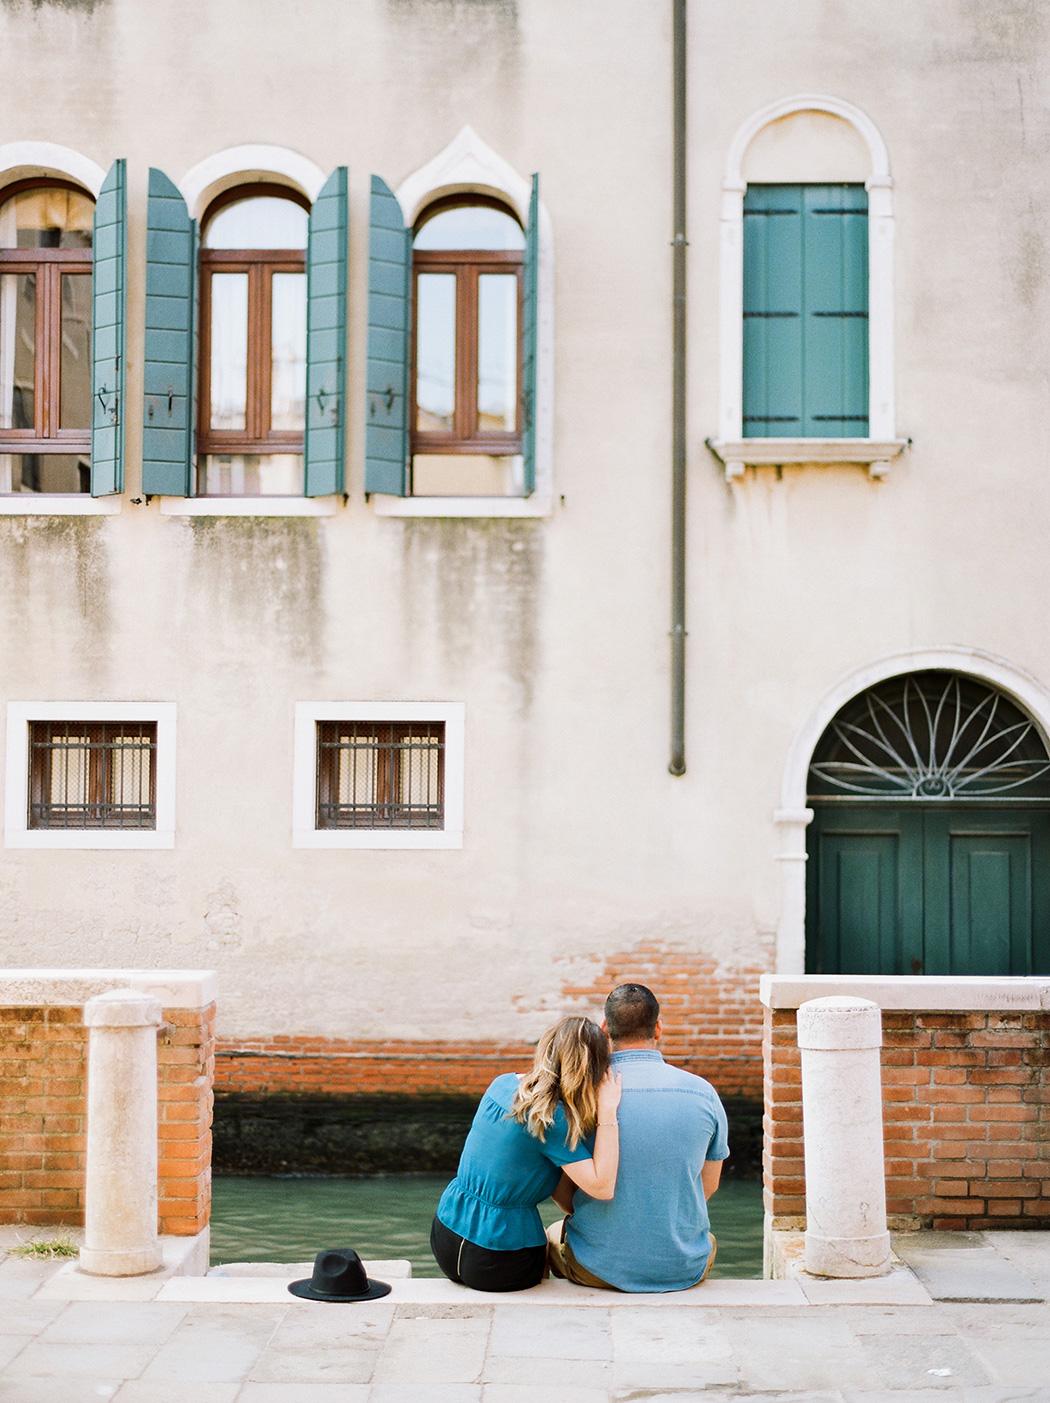 041S&E_Venice.jpg